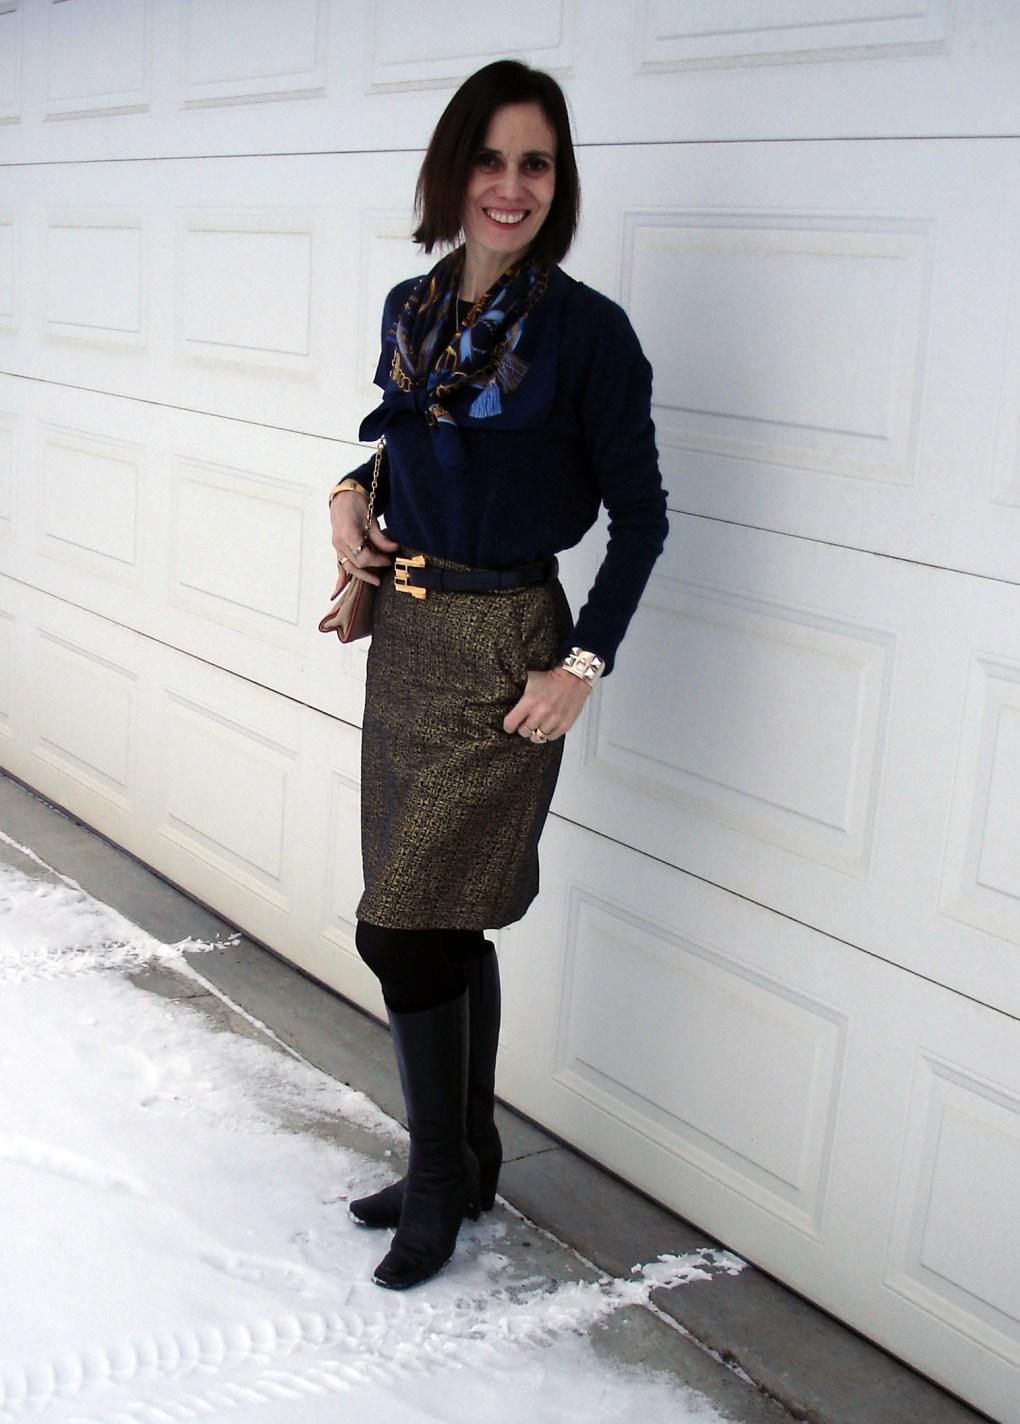 #midlifefashion mature woman wearing a brocade skirt